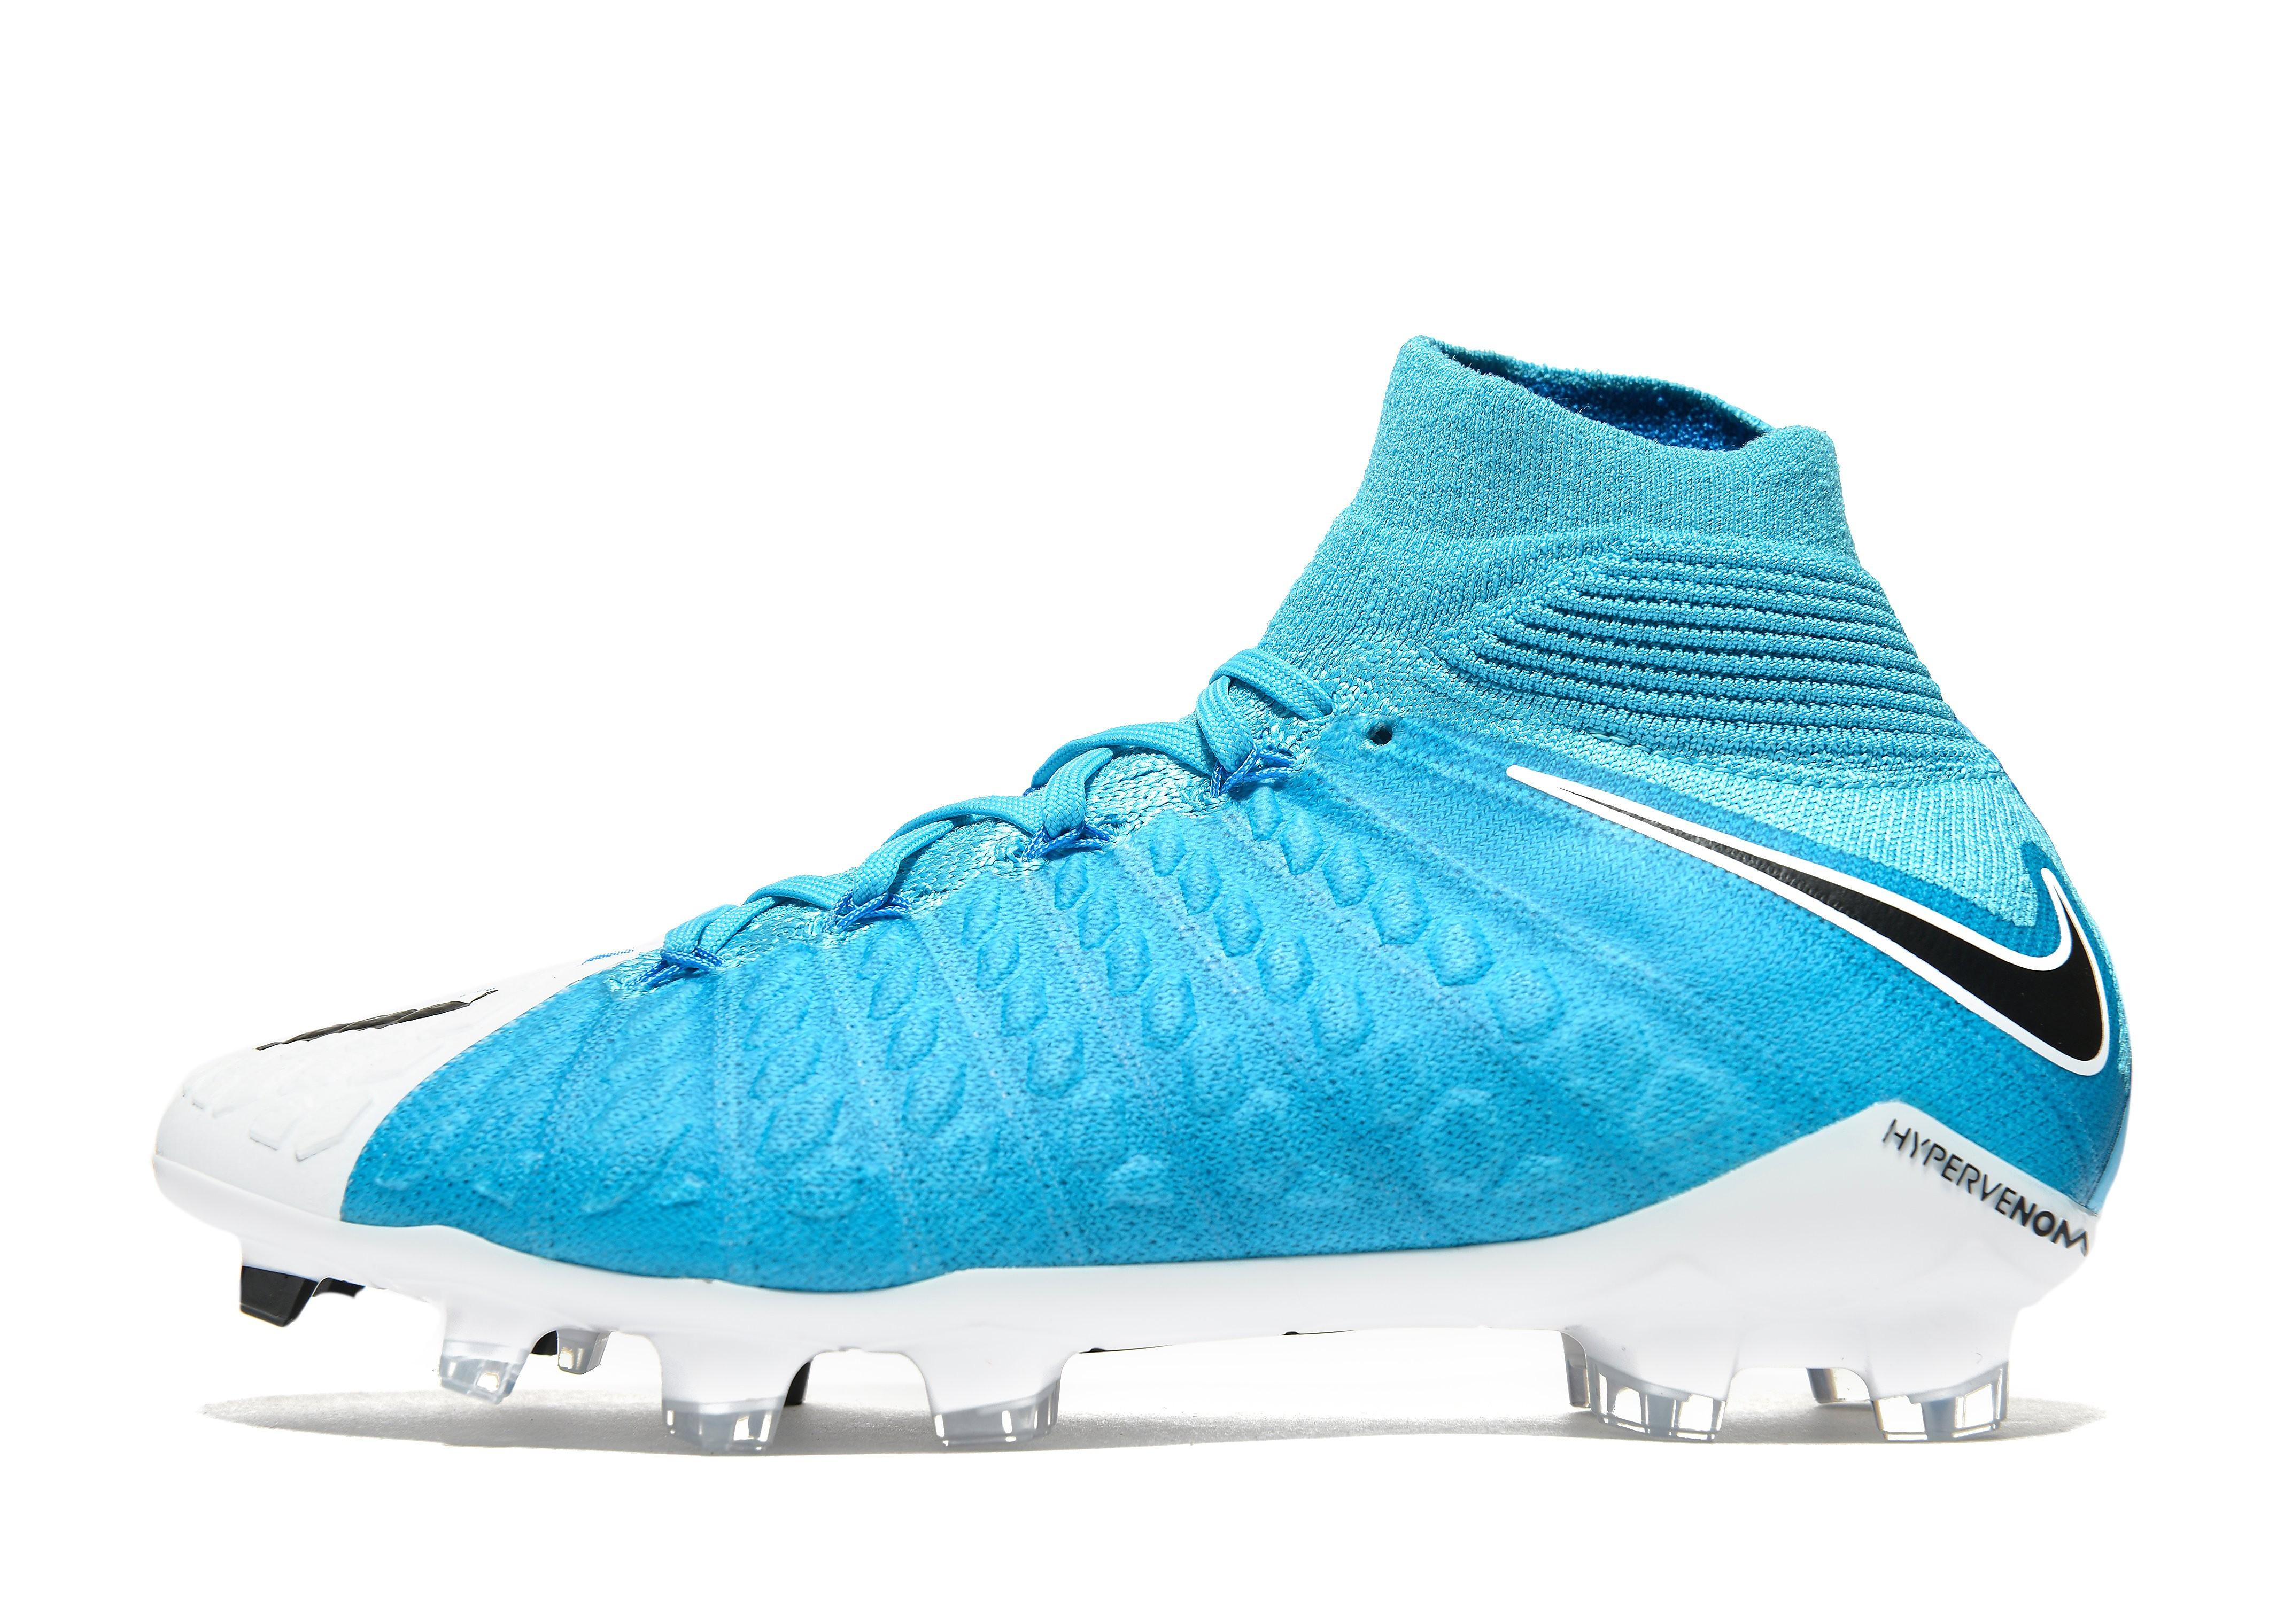 Nike Hypervenom Phantom 3 DF Junior FG Football Boots